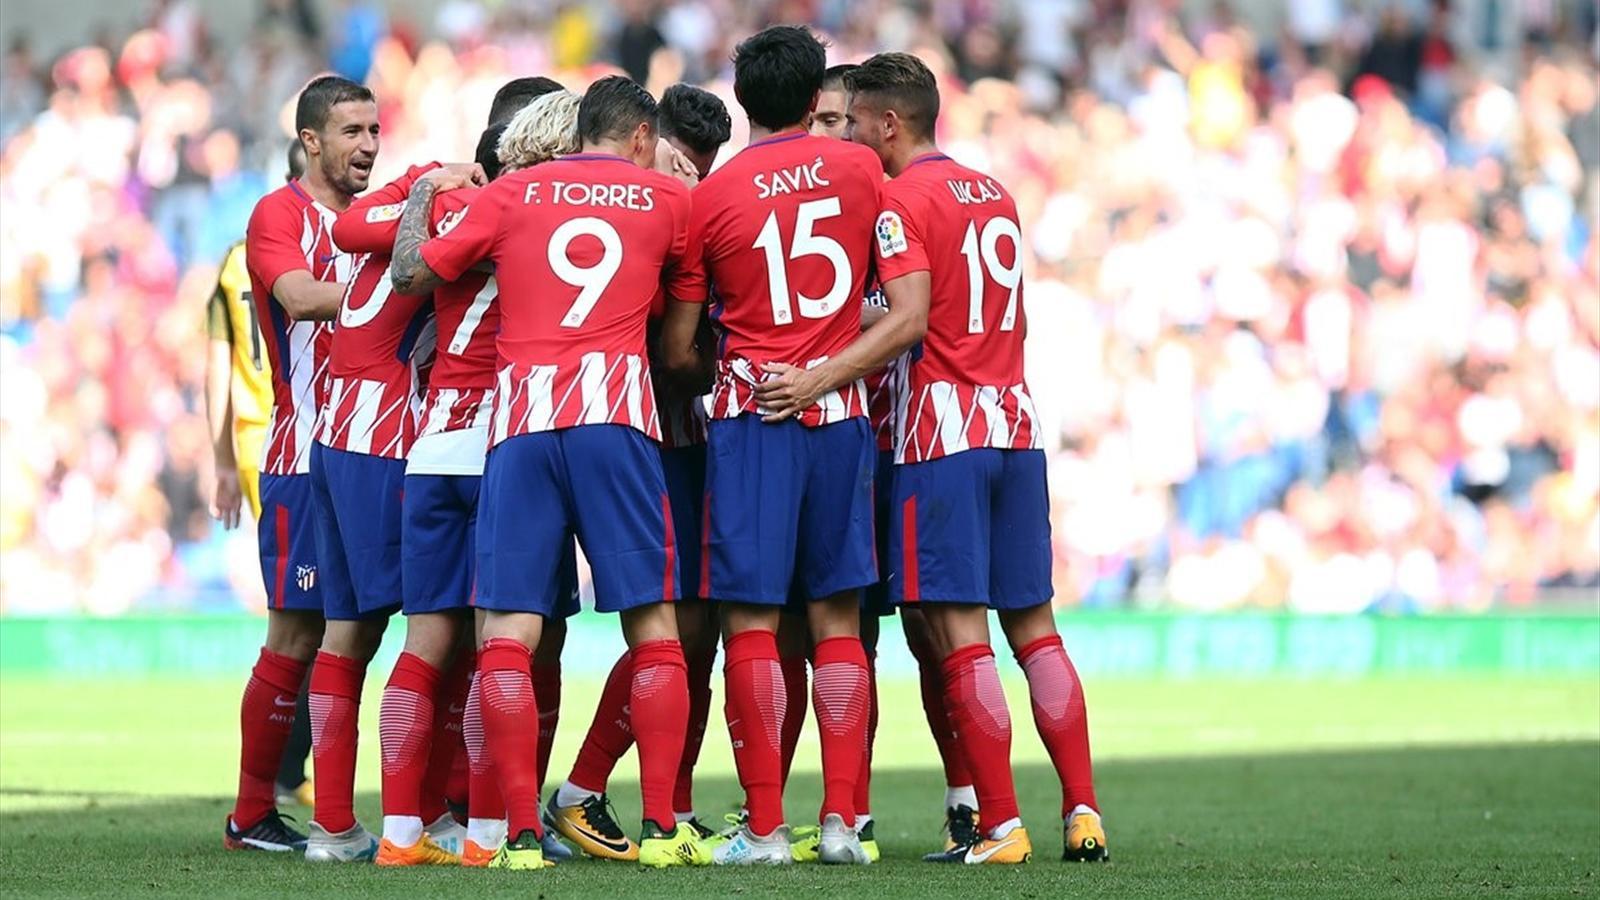 En directo   LIVE Girona - Atlético de Madrid - La Liga - 19 agosto 2017 -  Eurosport Espana 06ab3ff85a132